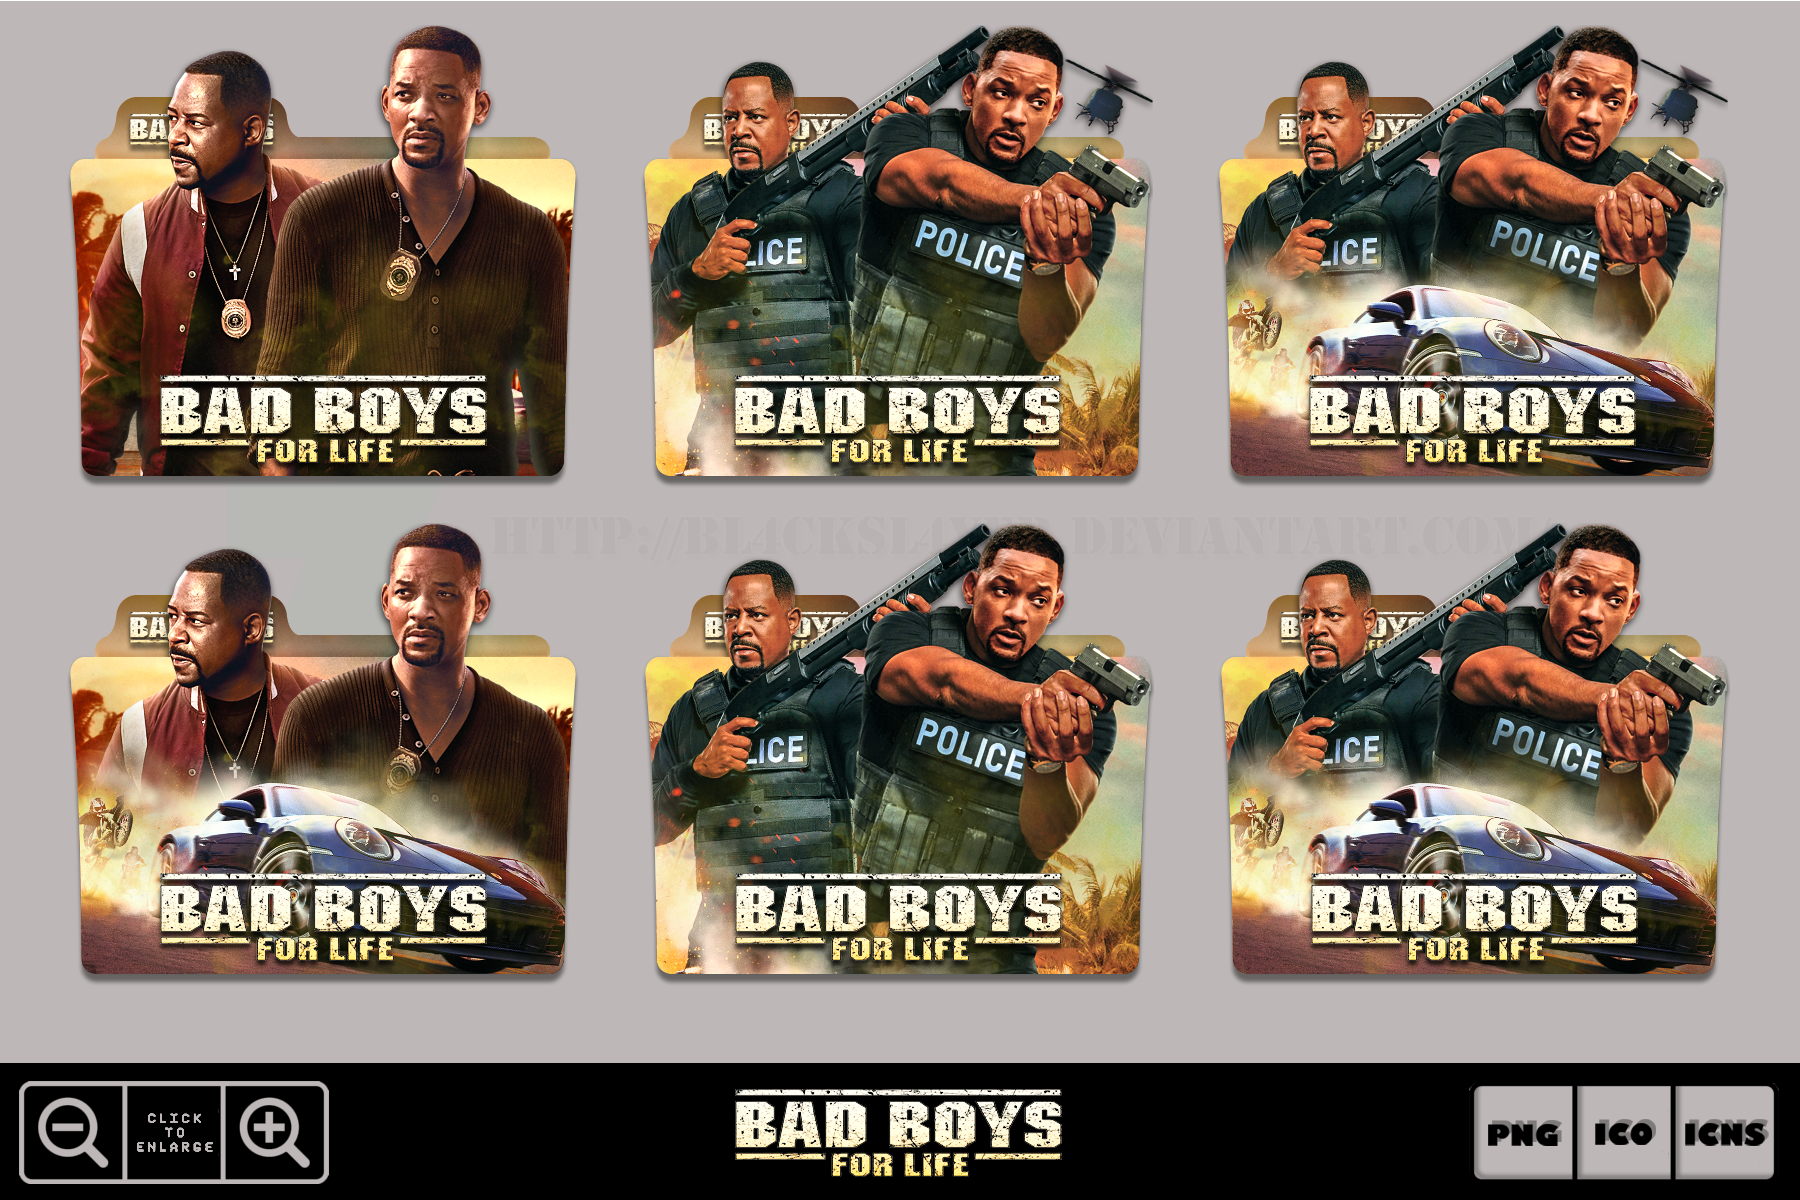 Bad Boys For Life 2020 Folder Icon Pack By Bl4cksl4yer On Deviantart